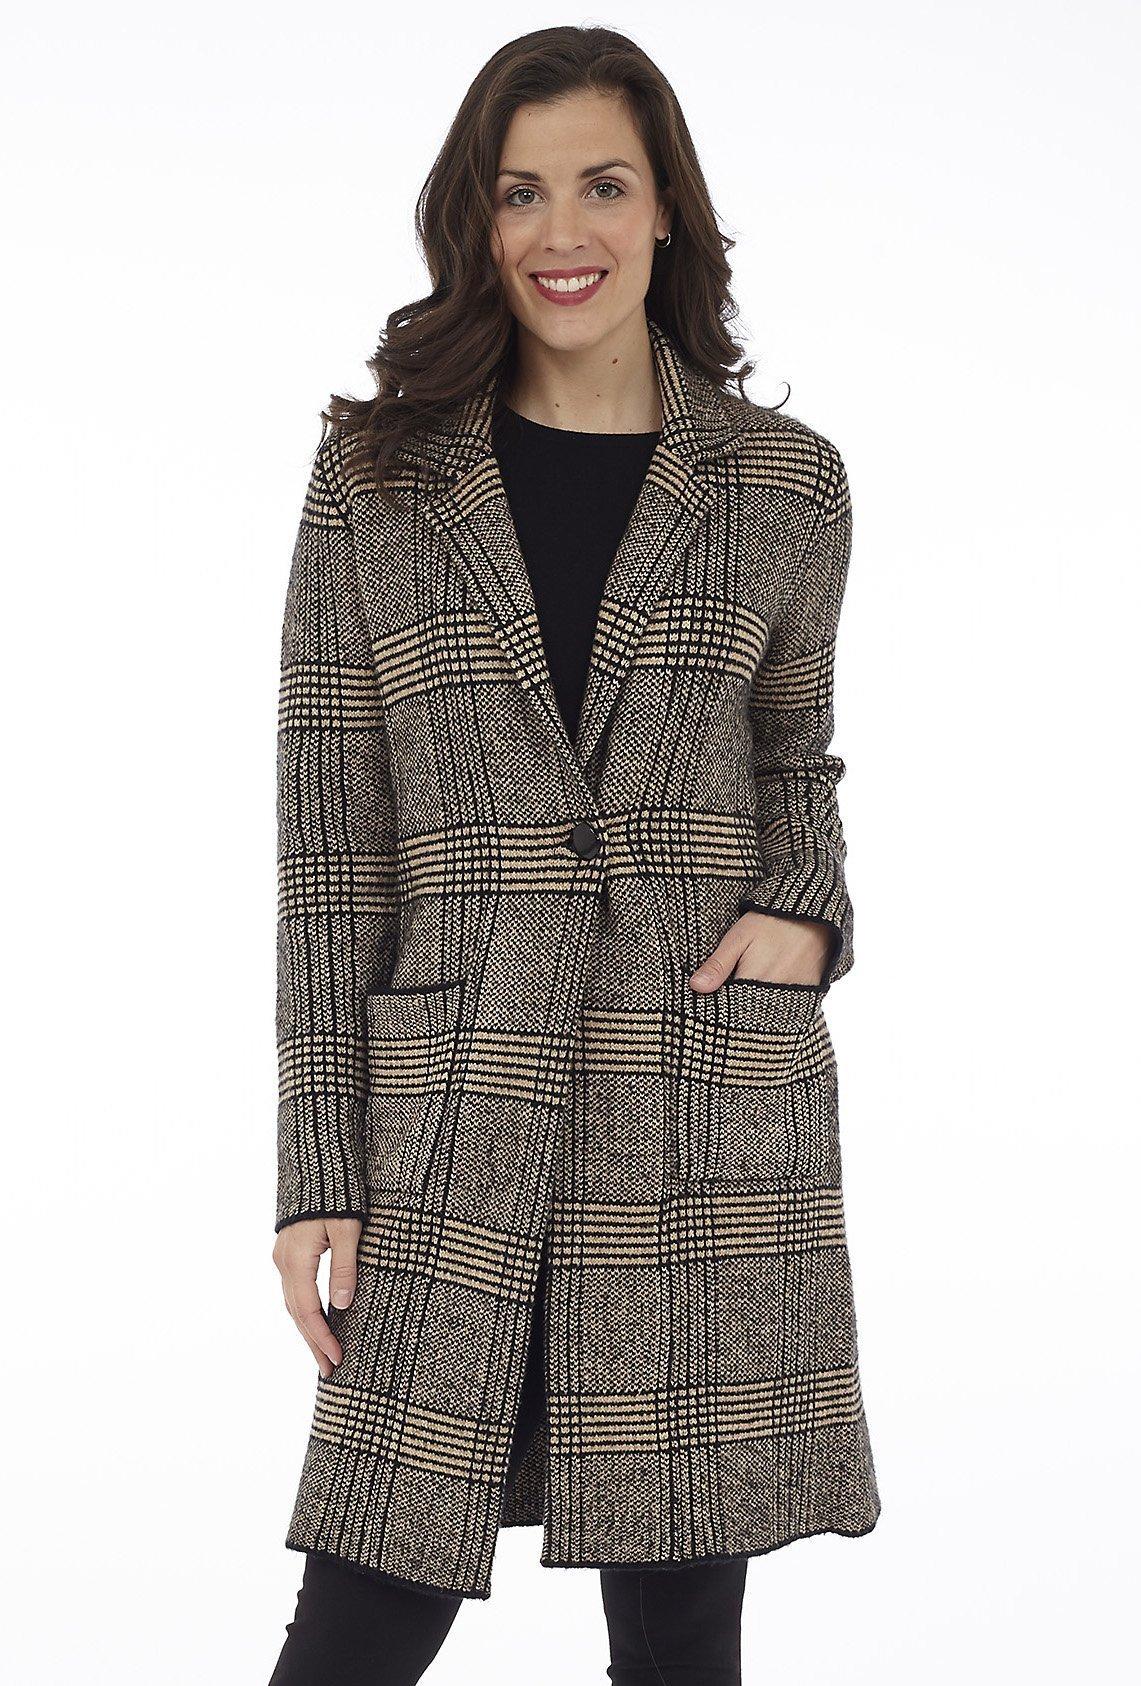 Plaid Knit Jacket with Pockets